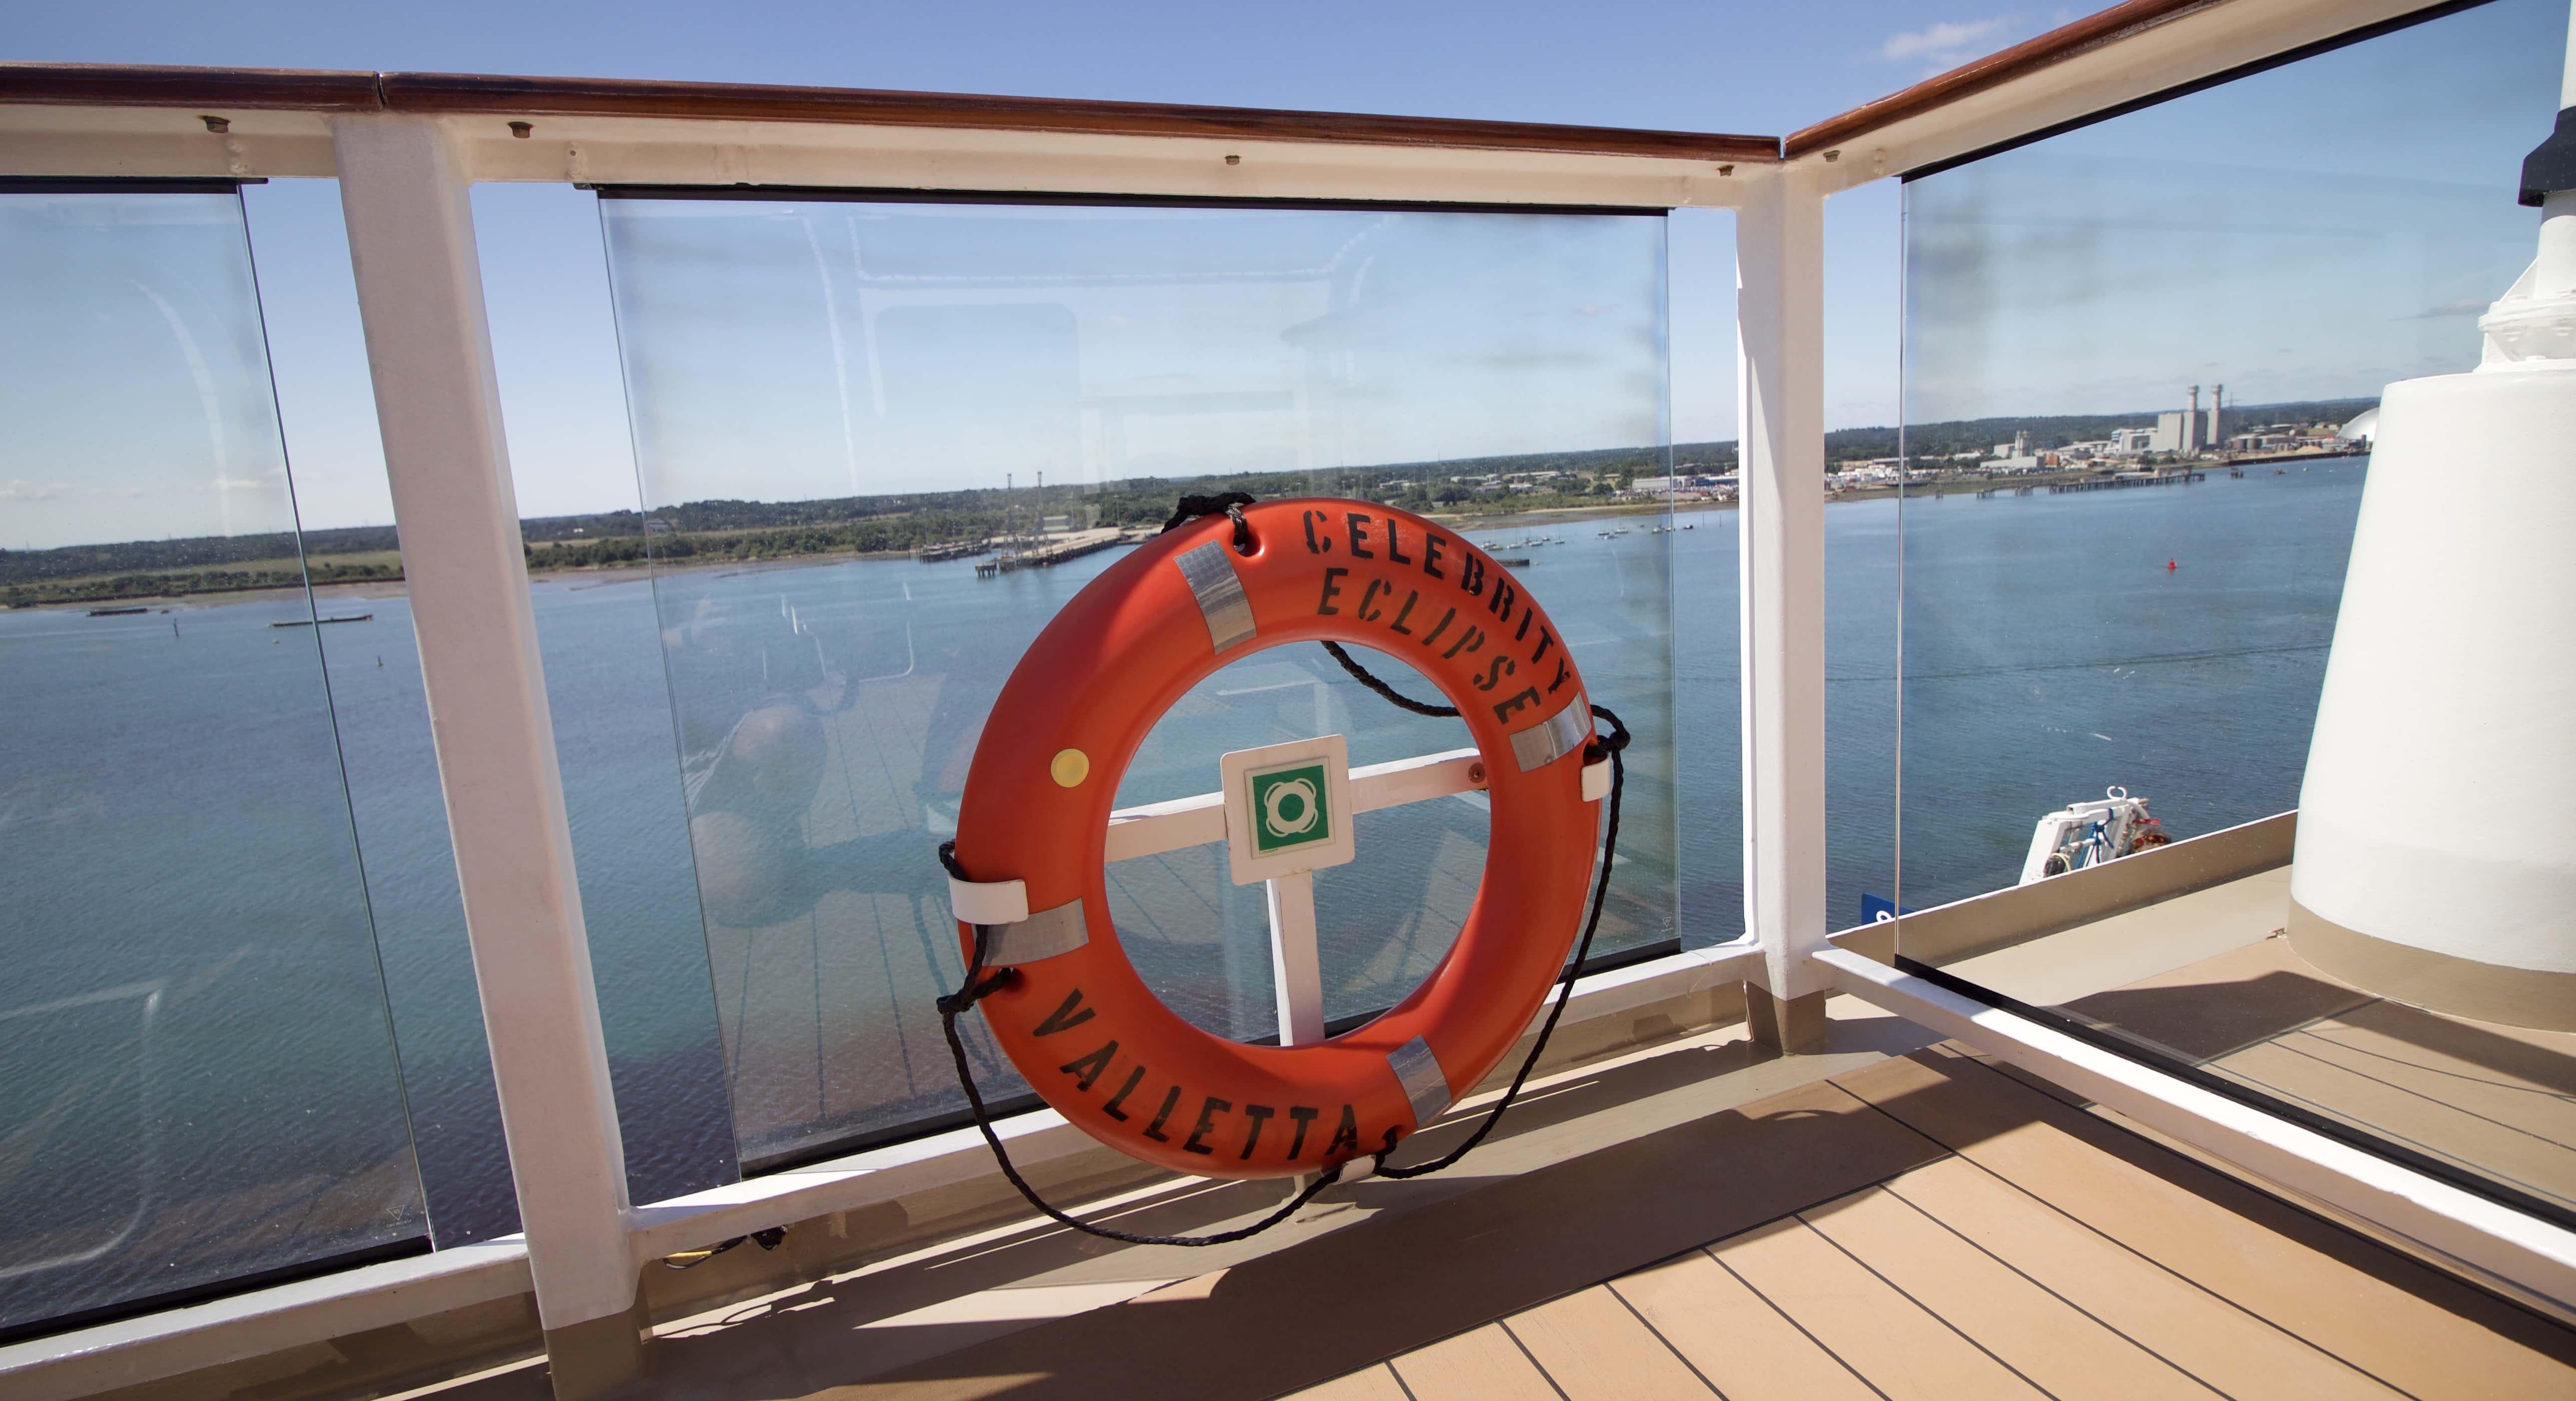 Celebrity Eclipse - Valletta life deck balcony view